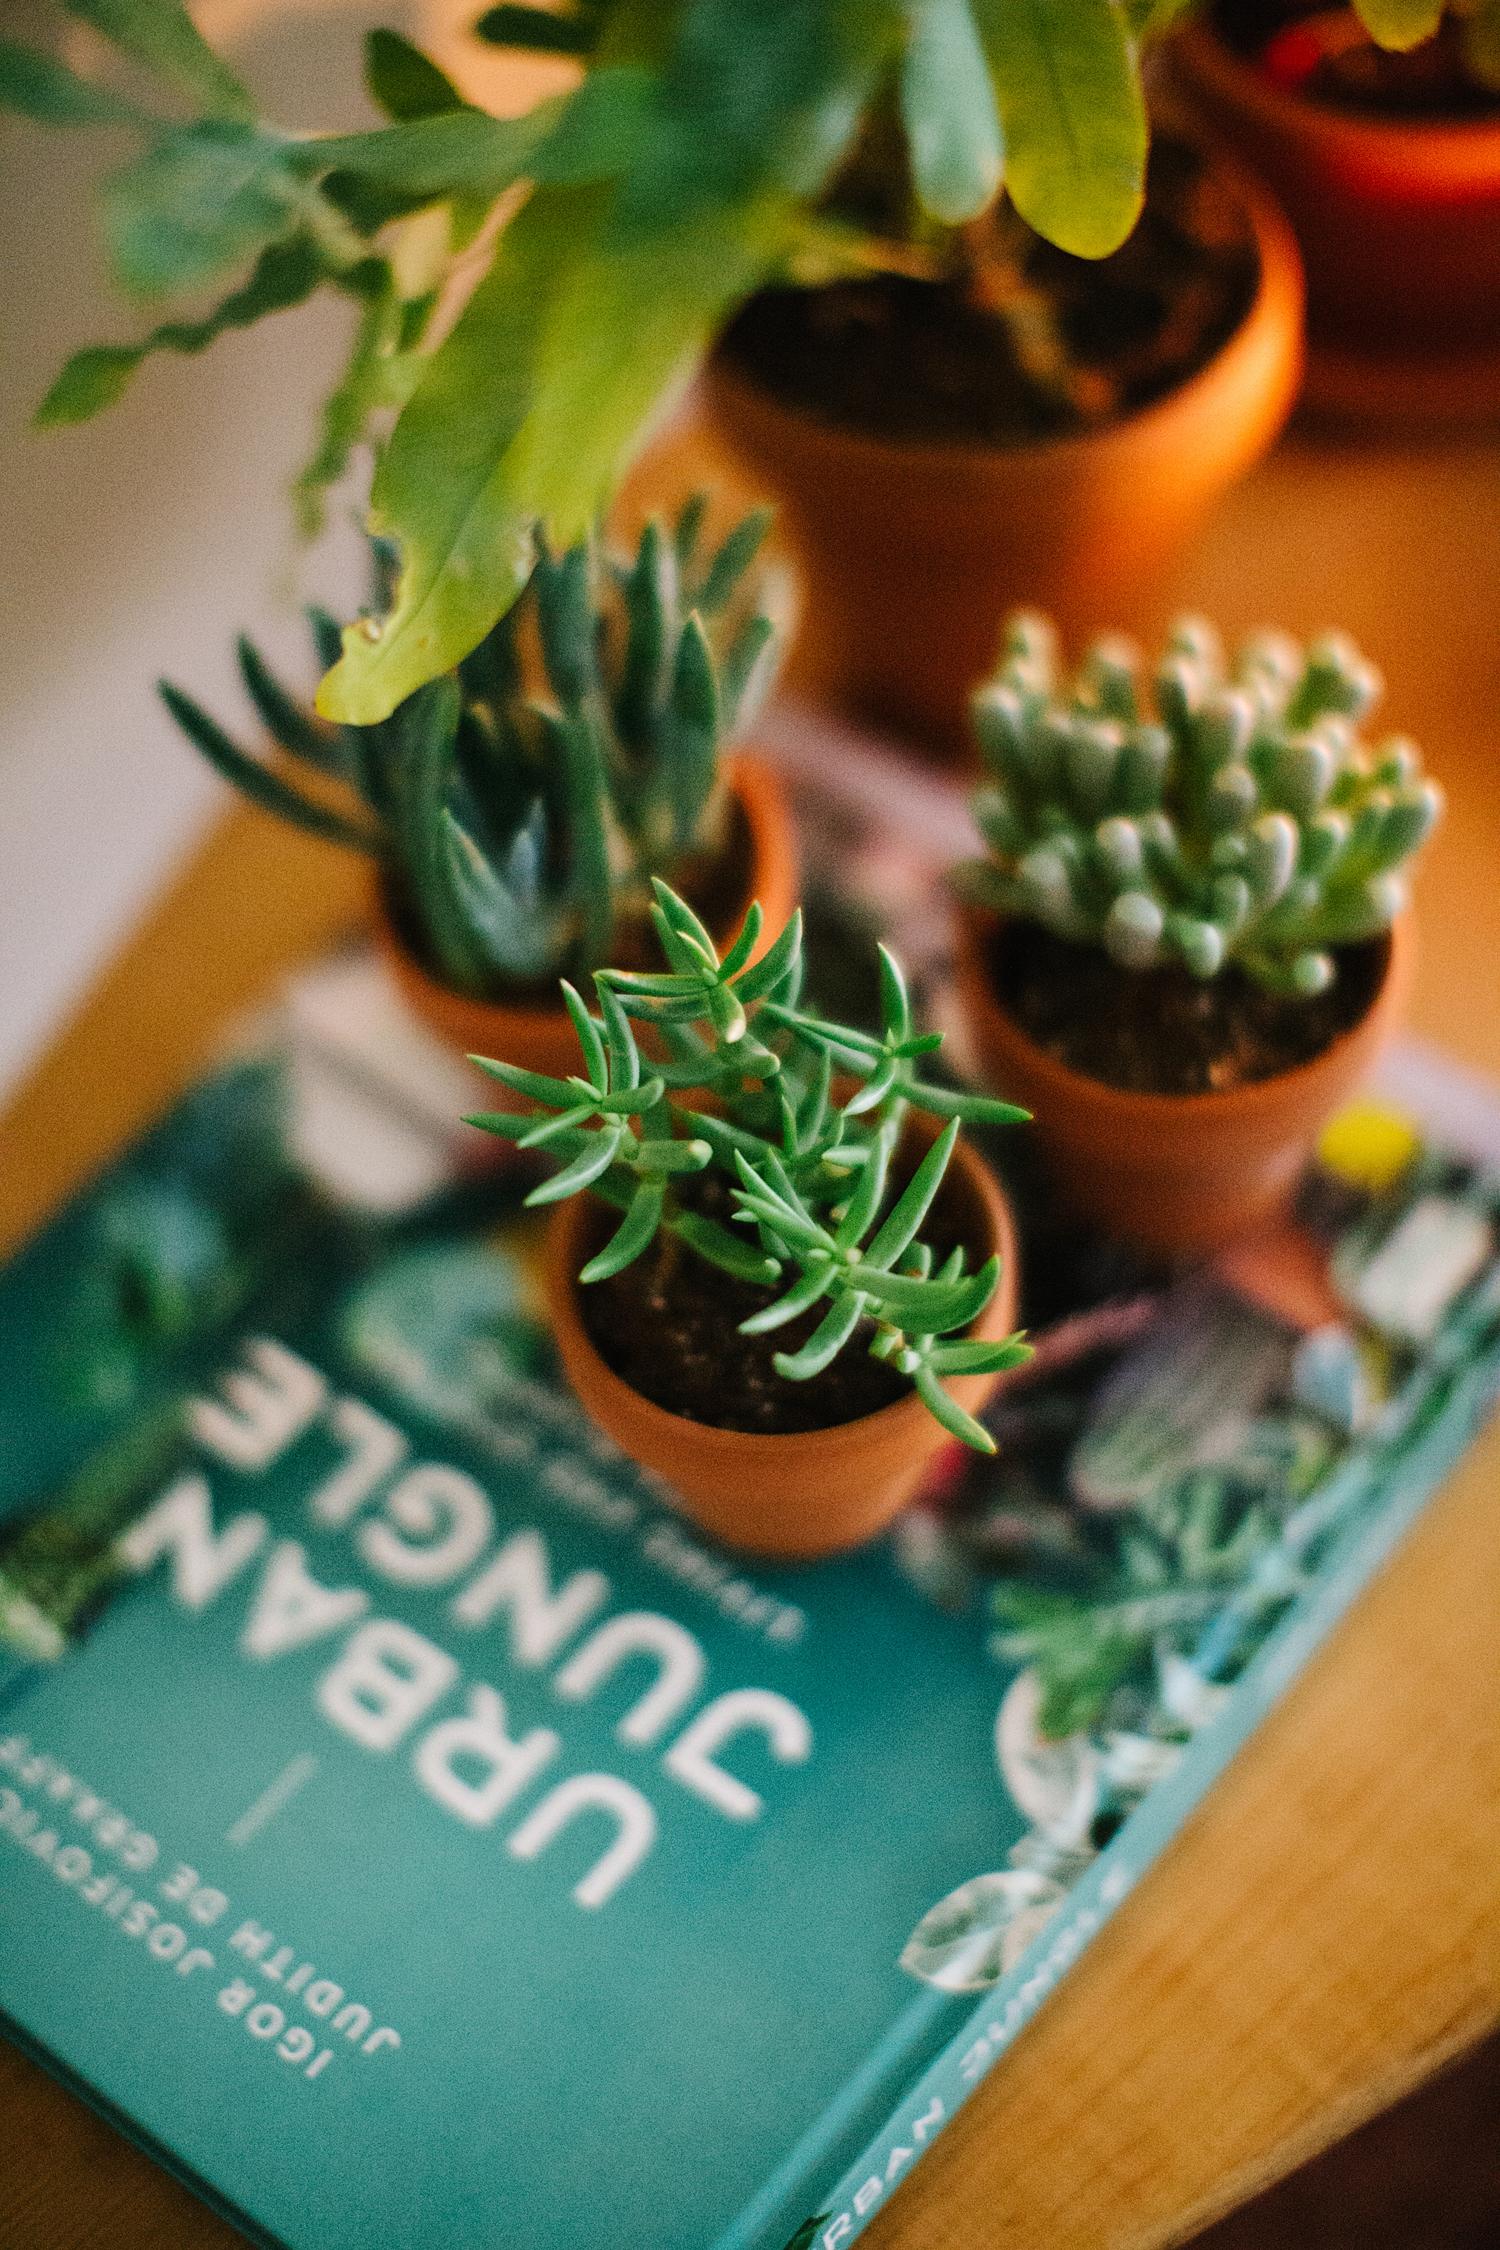 Book and plant stack the perfect urban jungle design.